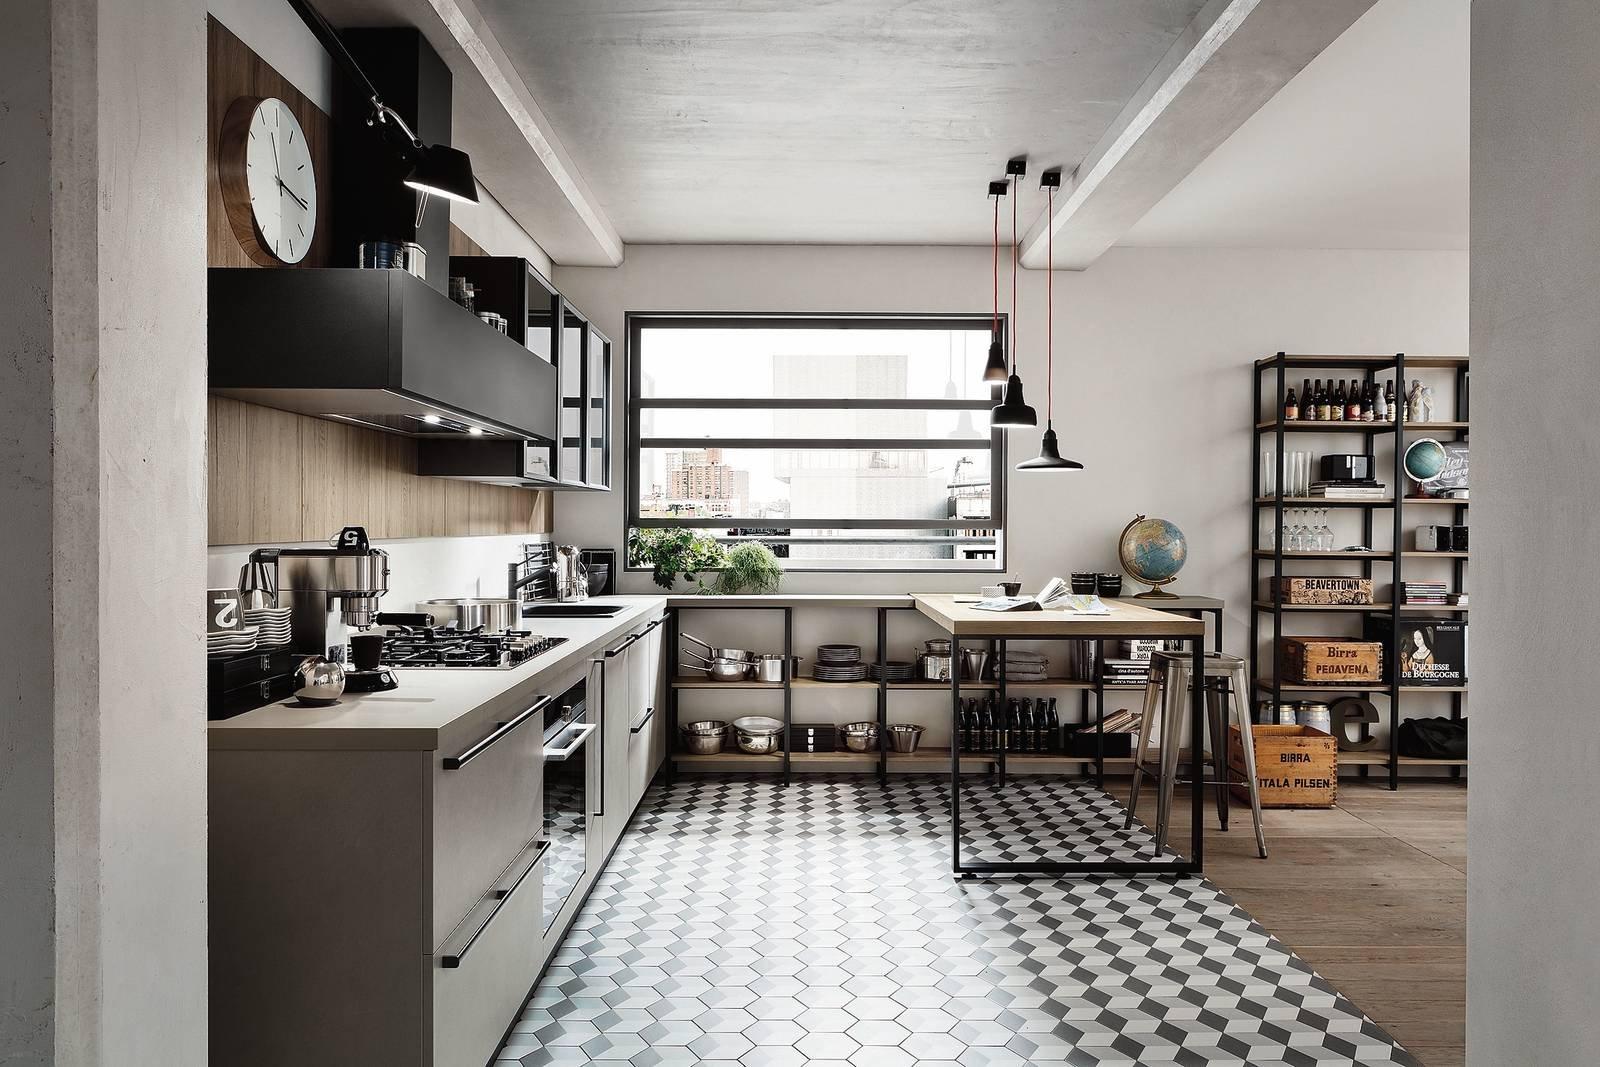 Cucine dal carattere deciso per atmosfere industrial style - Cucine urban style ...